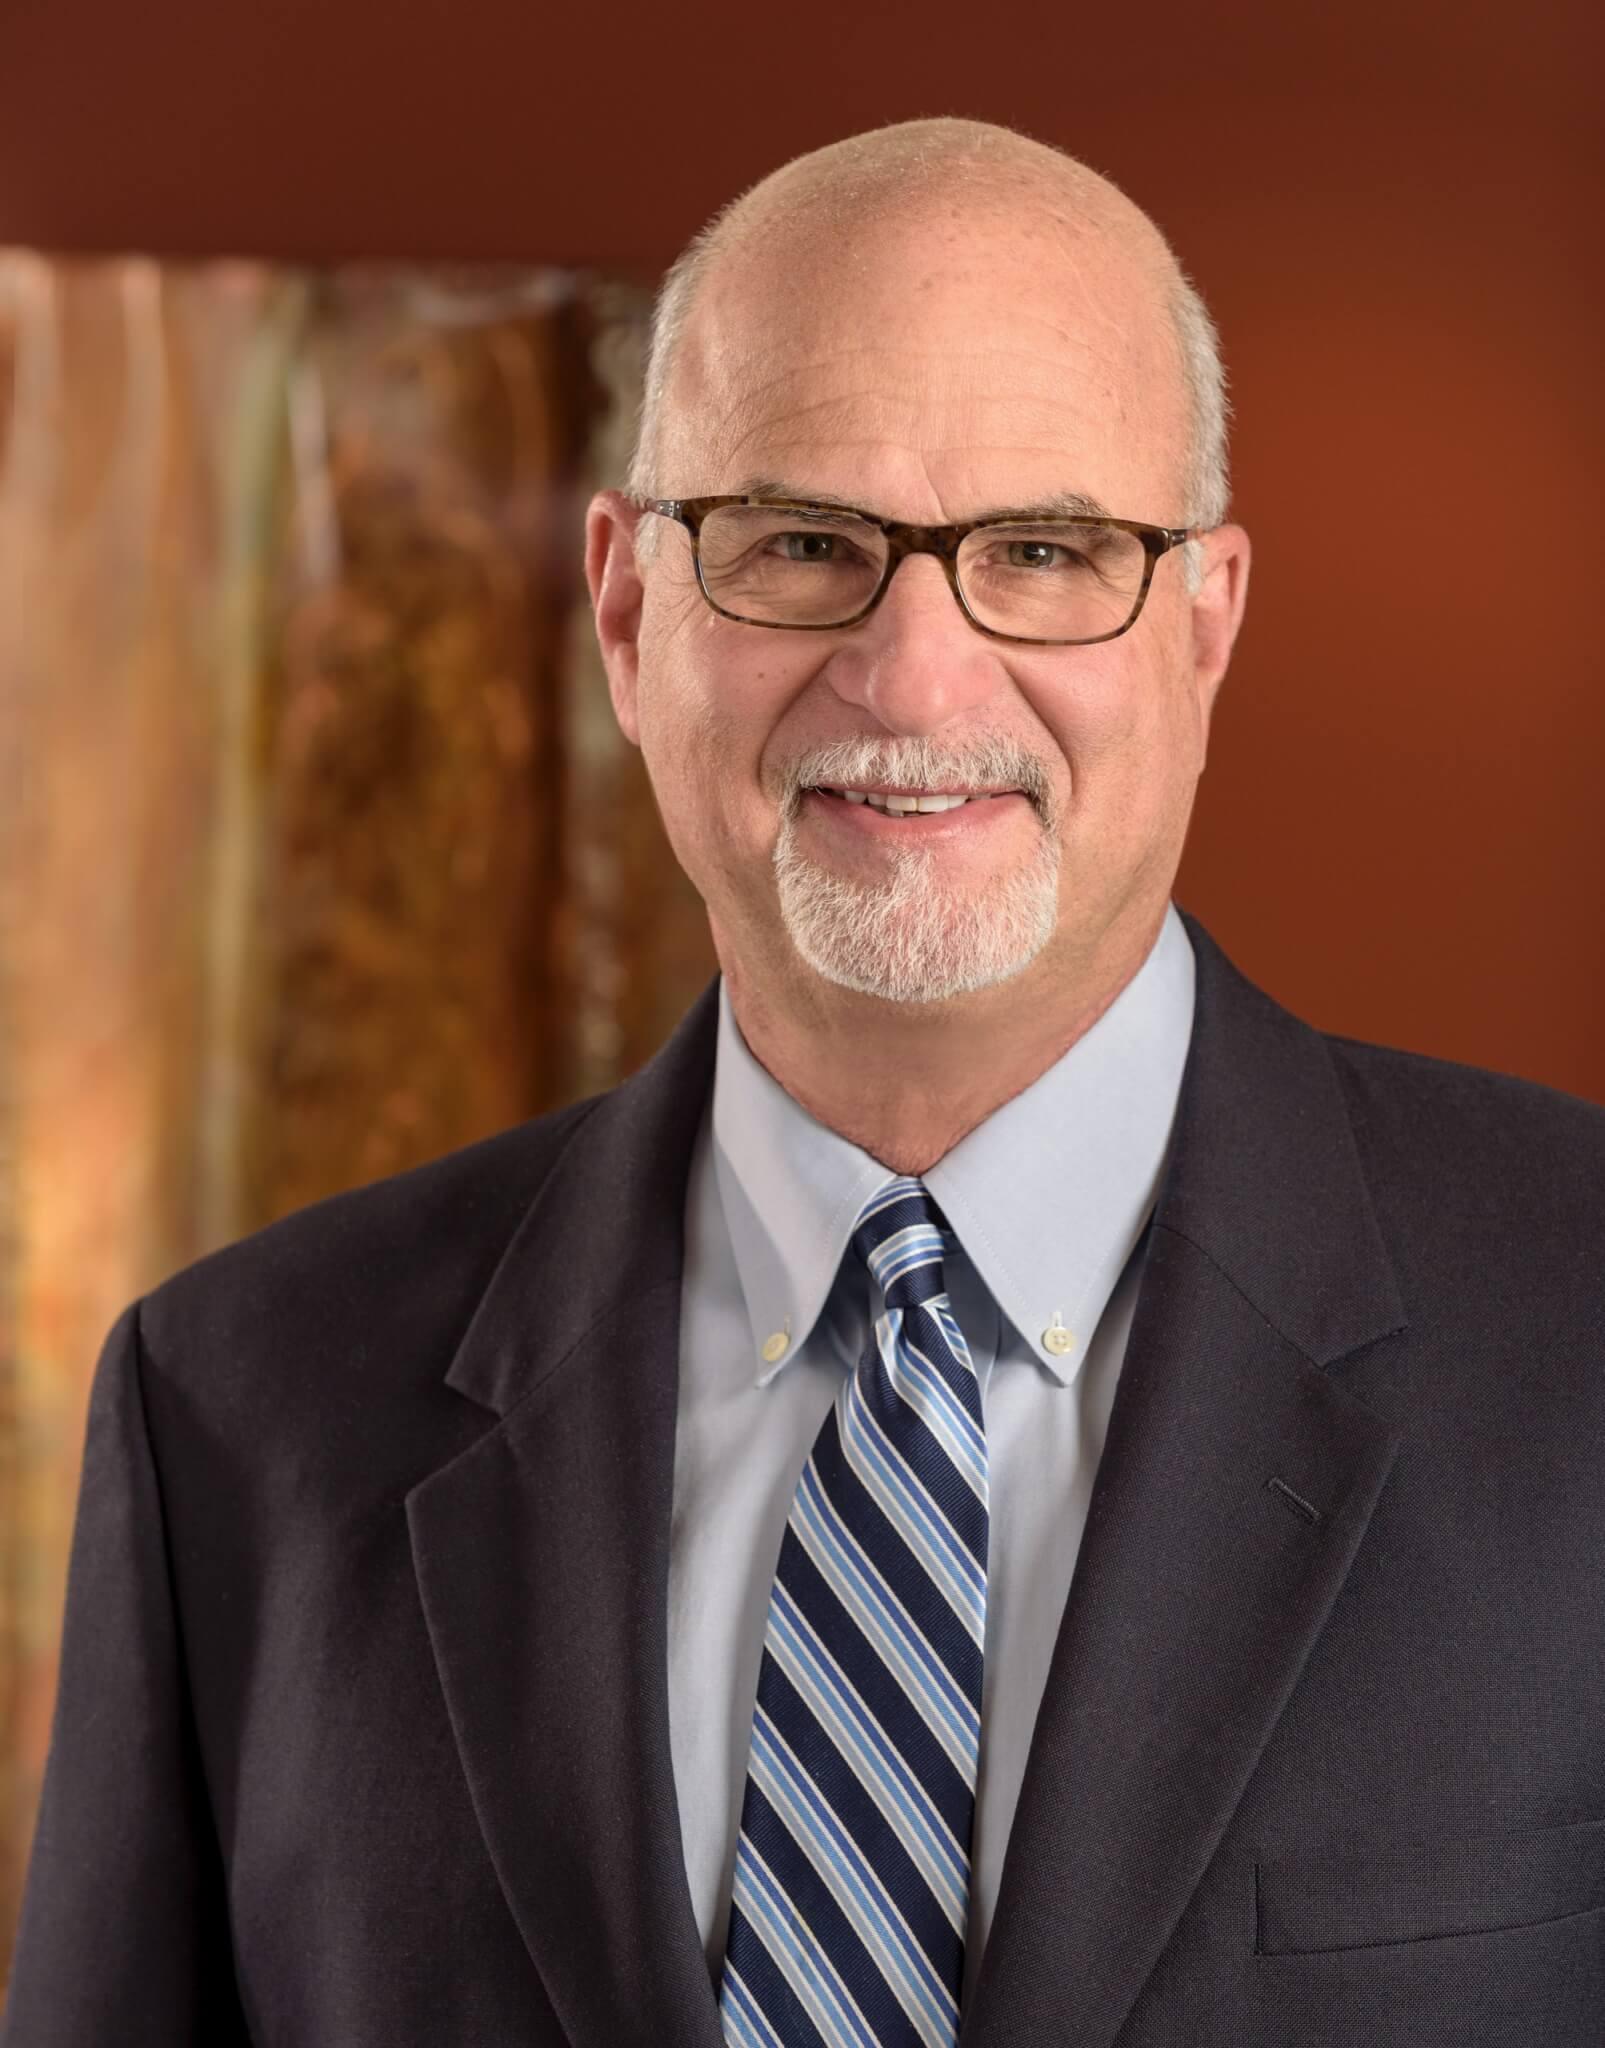 Dr. Marc Pliskin